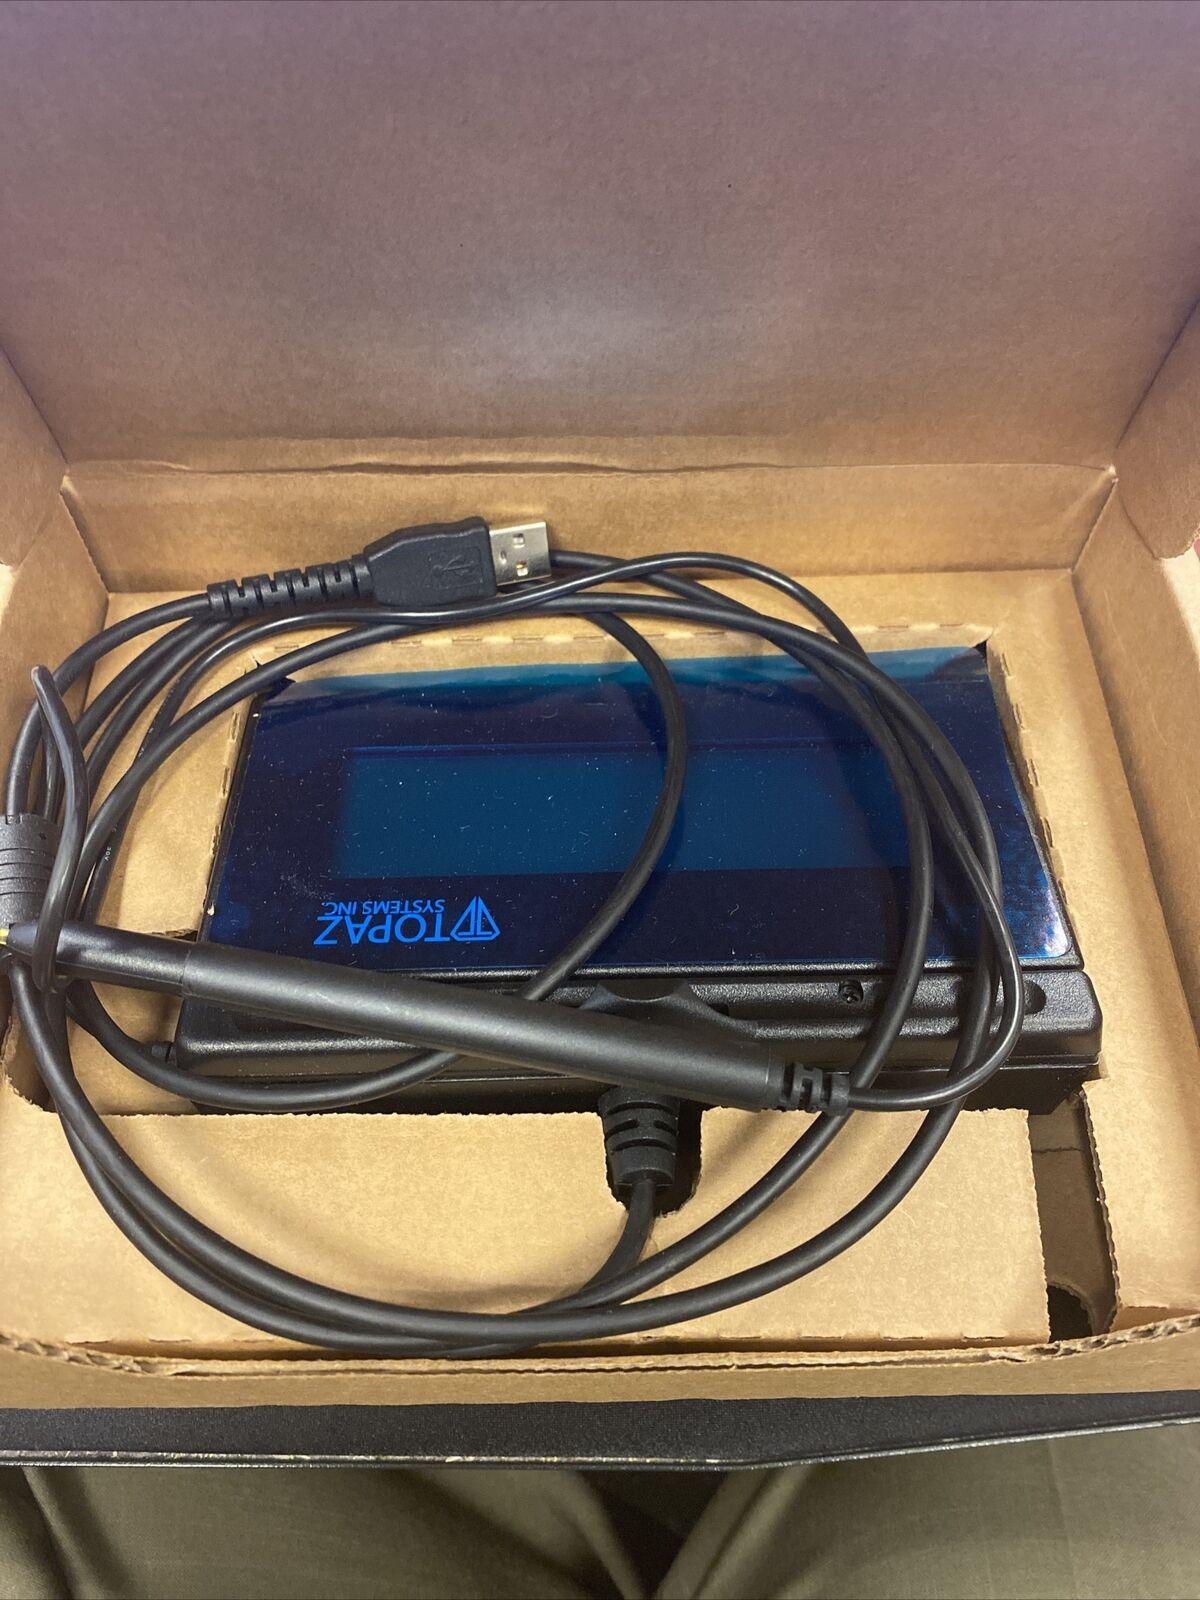 Topaz SignatureGem  TLBK462BSBR Backlit LCD Signature Capture Pad USB